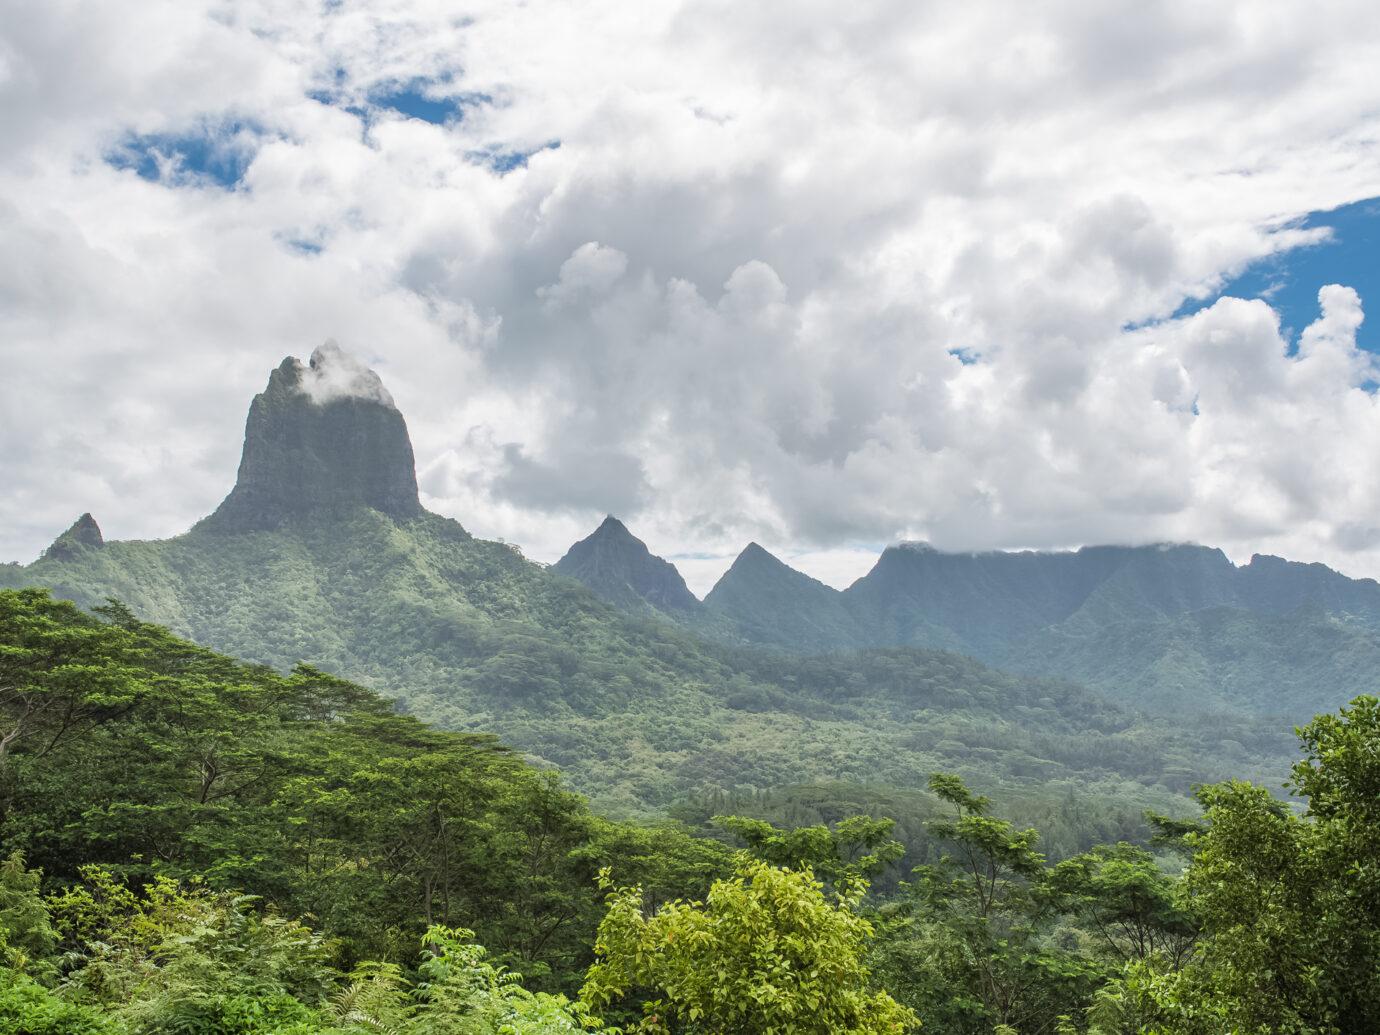 Moorea in Polynesia, Opunohu belvedere, beautiful panorama of the mountains